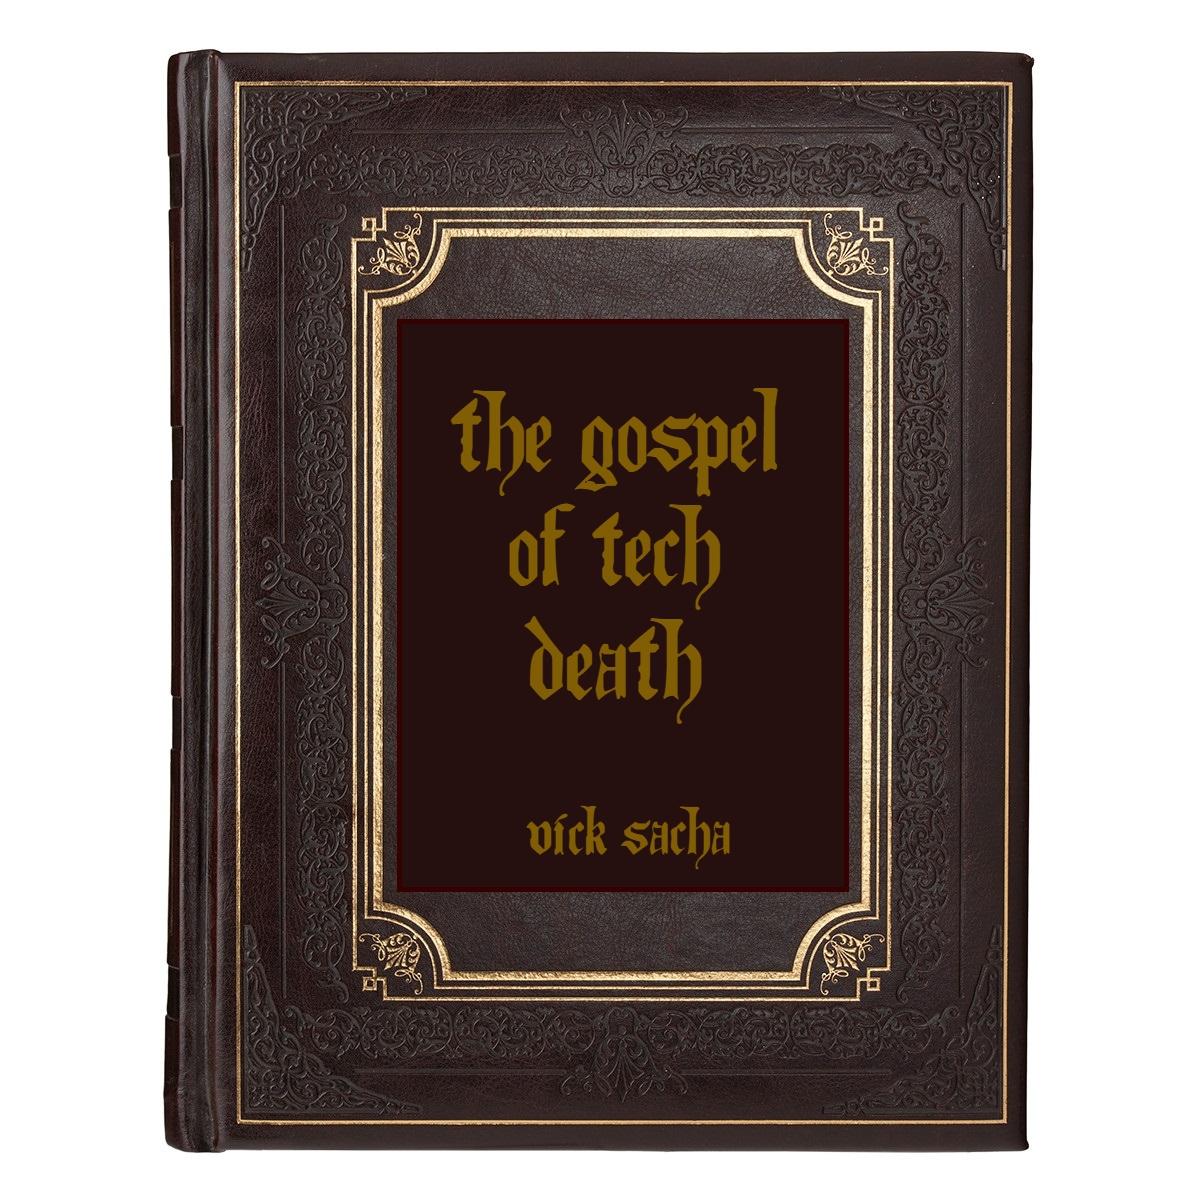 The Gospel of Tech Death: I